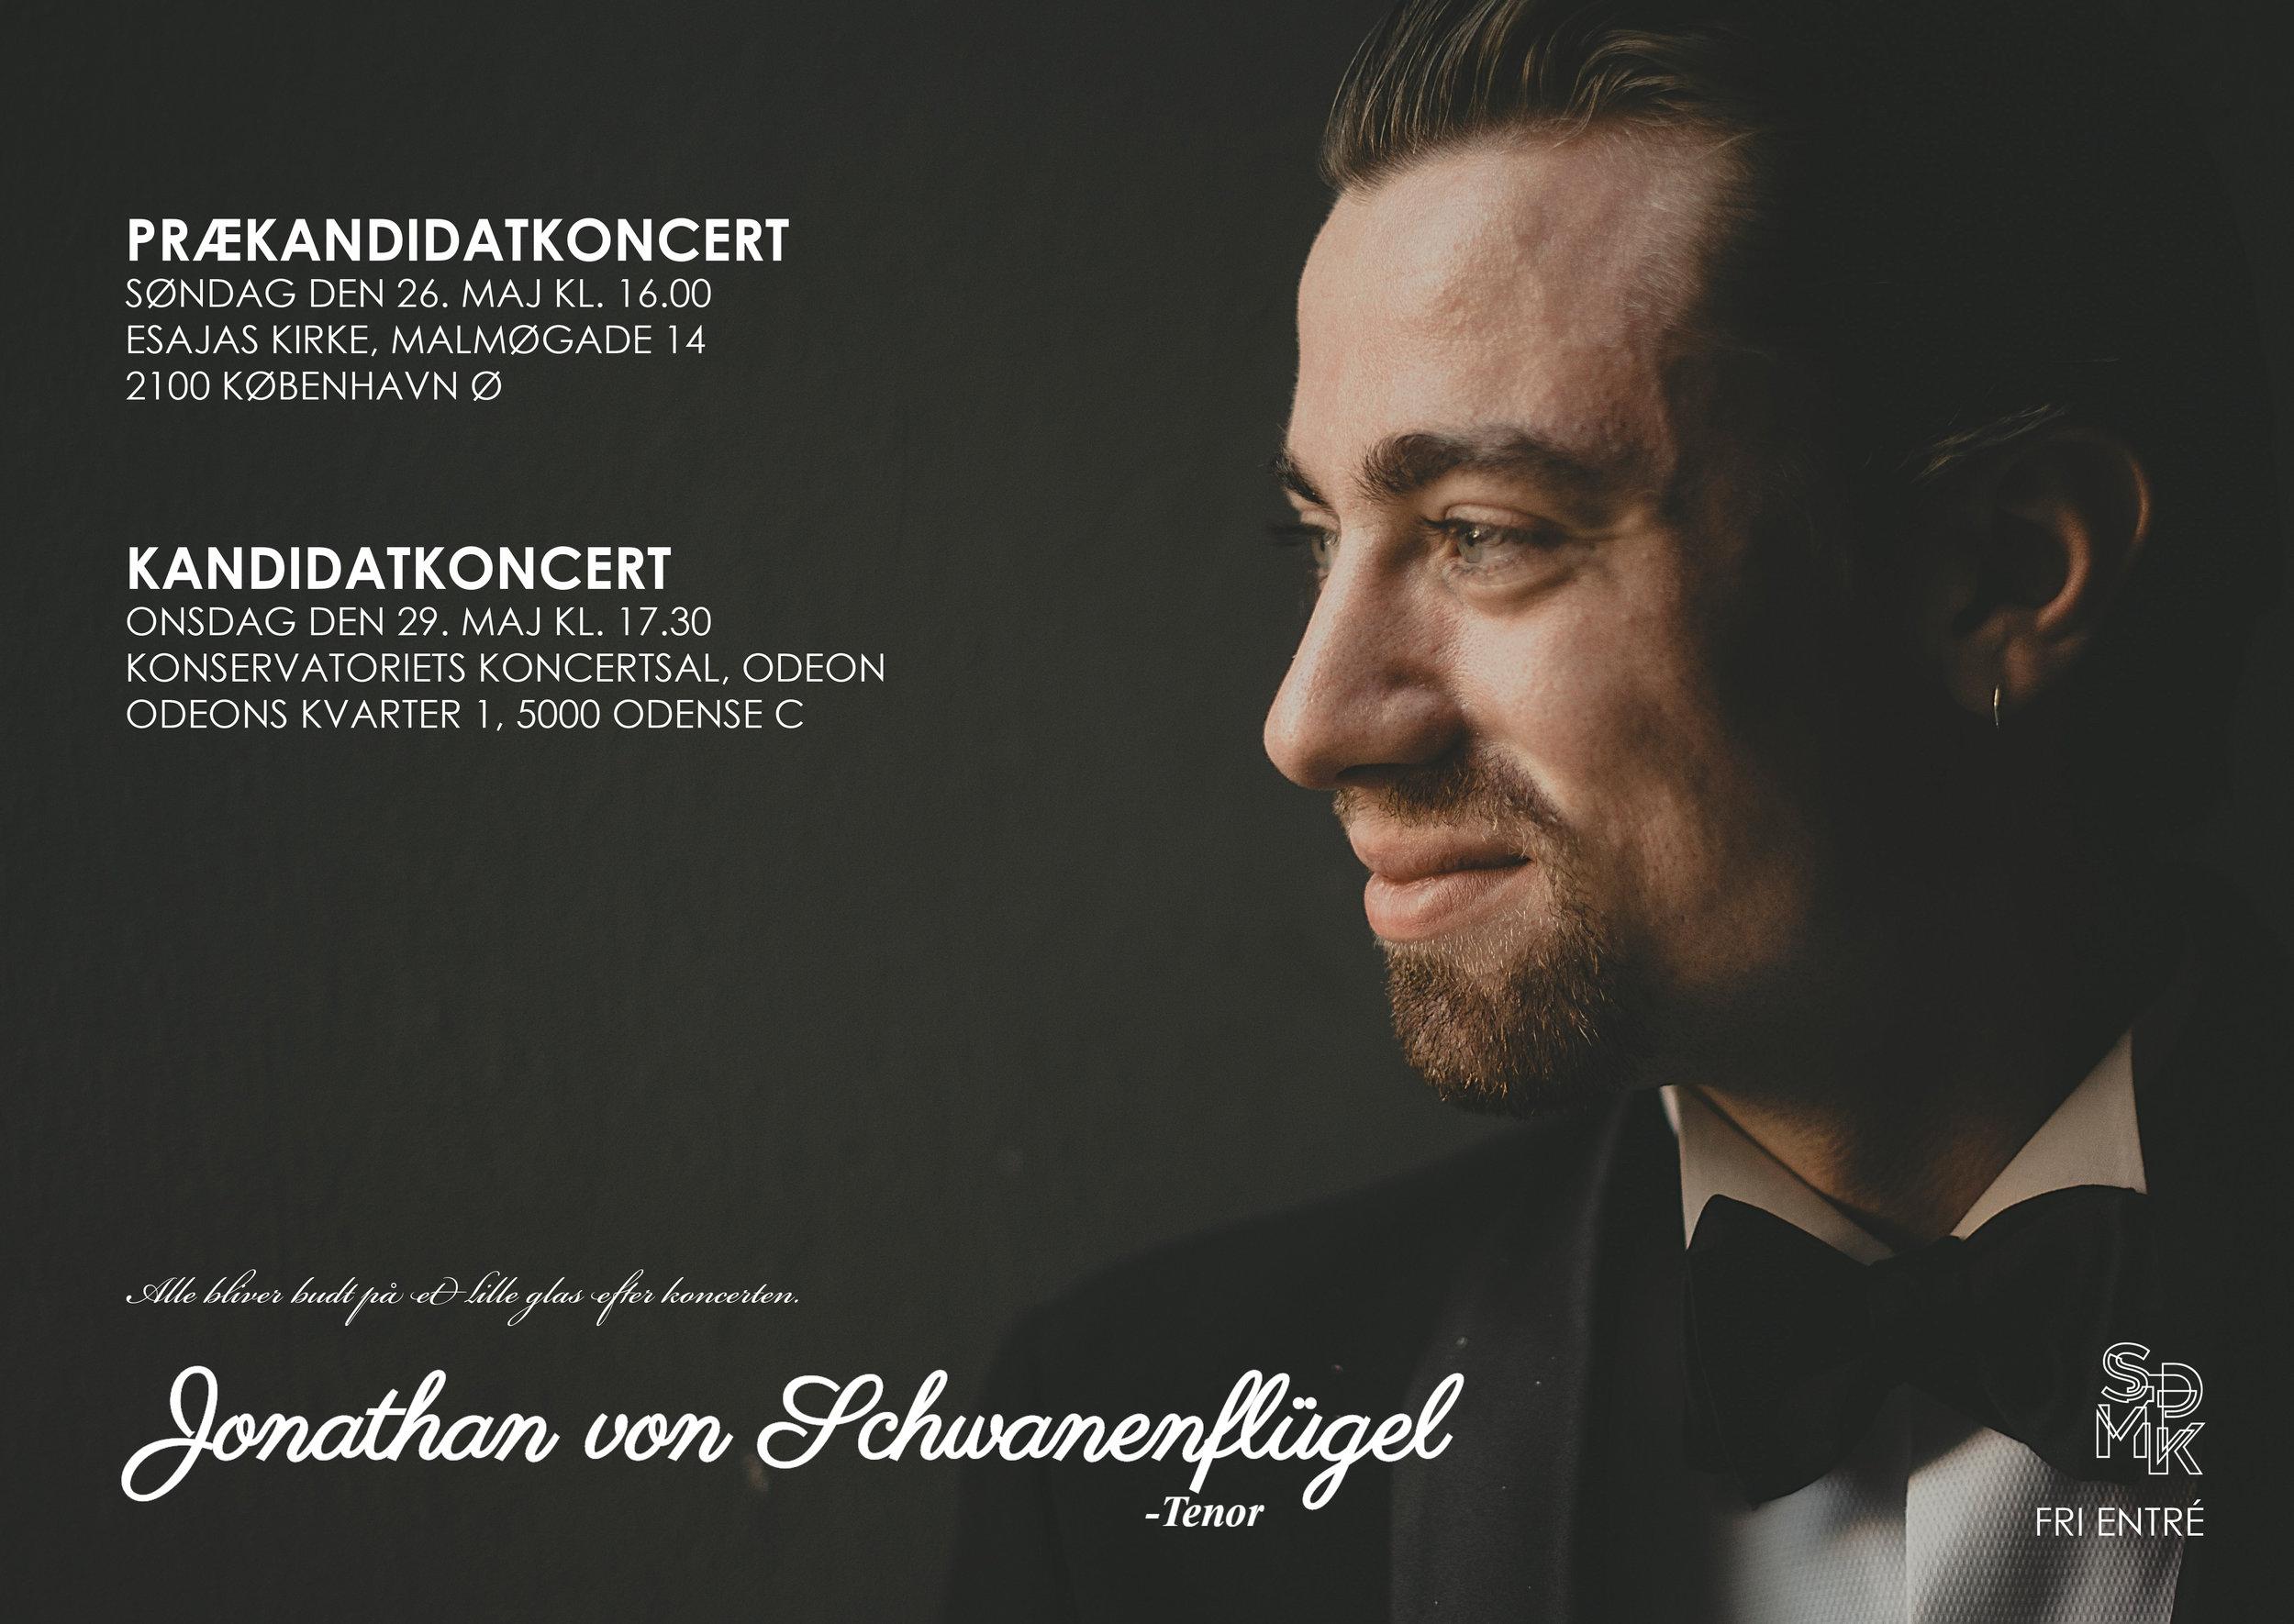 Jonathan_Schwanenflügel_ka_plakat2_2019.jpg